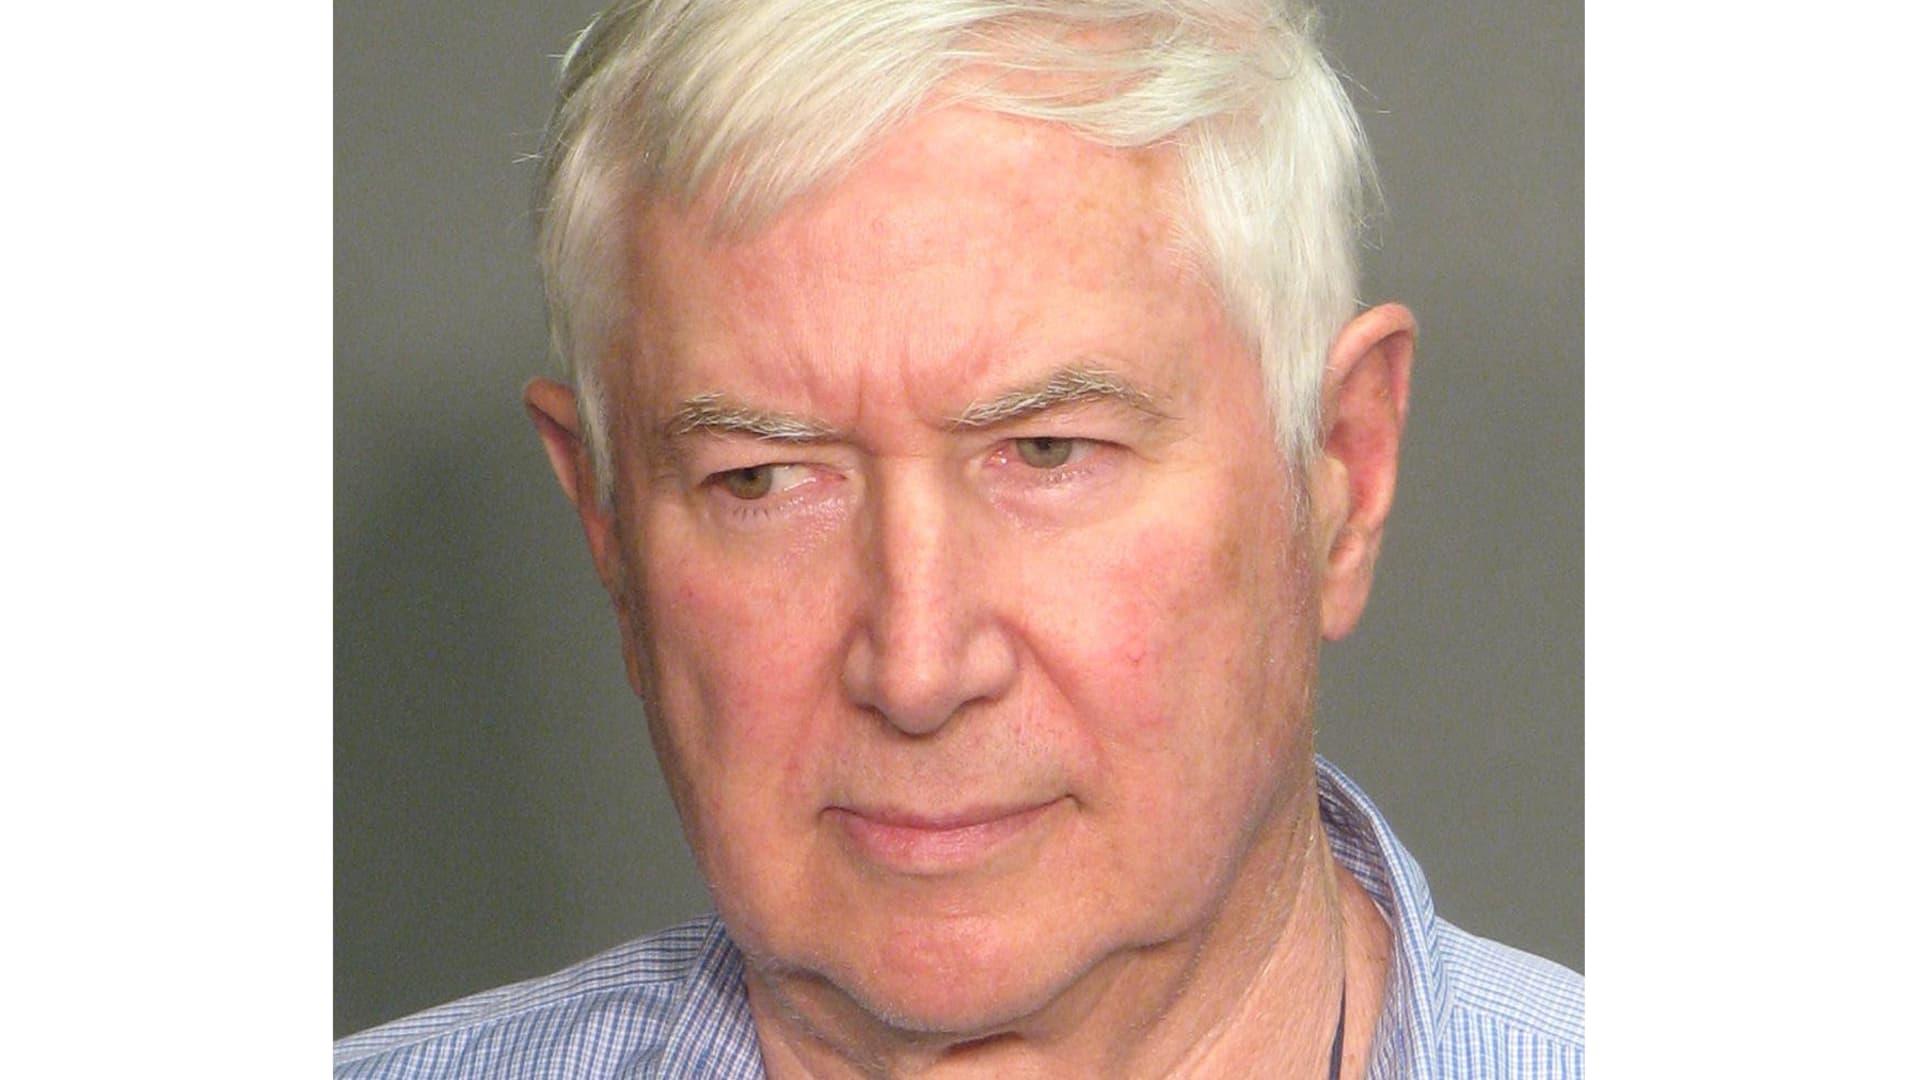 Peter Lee Coker mugshot from the Raleigh/Wake City-County Bureau of Identification (CCBI).